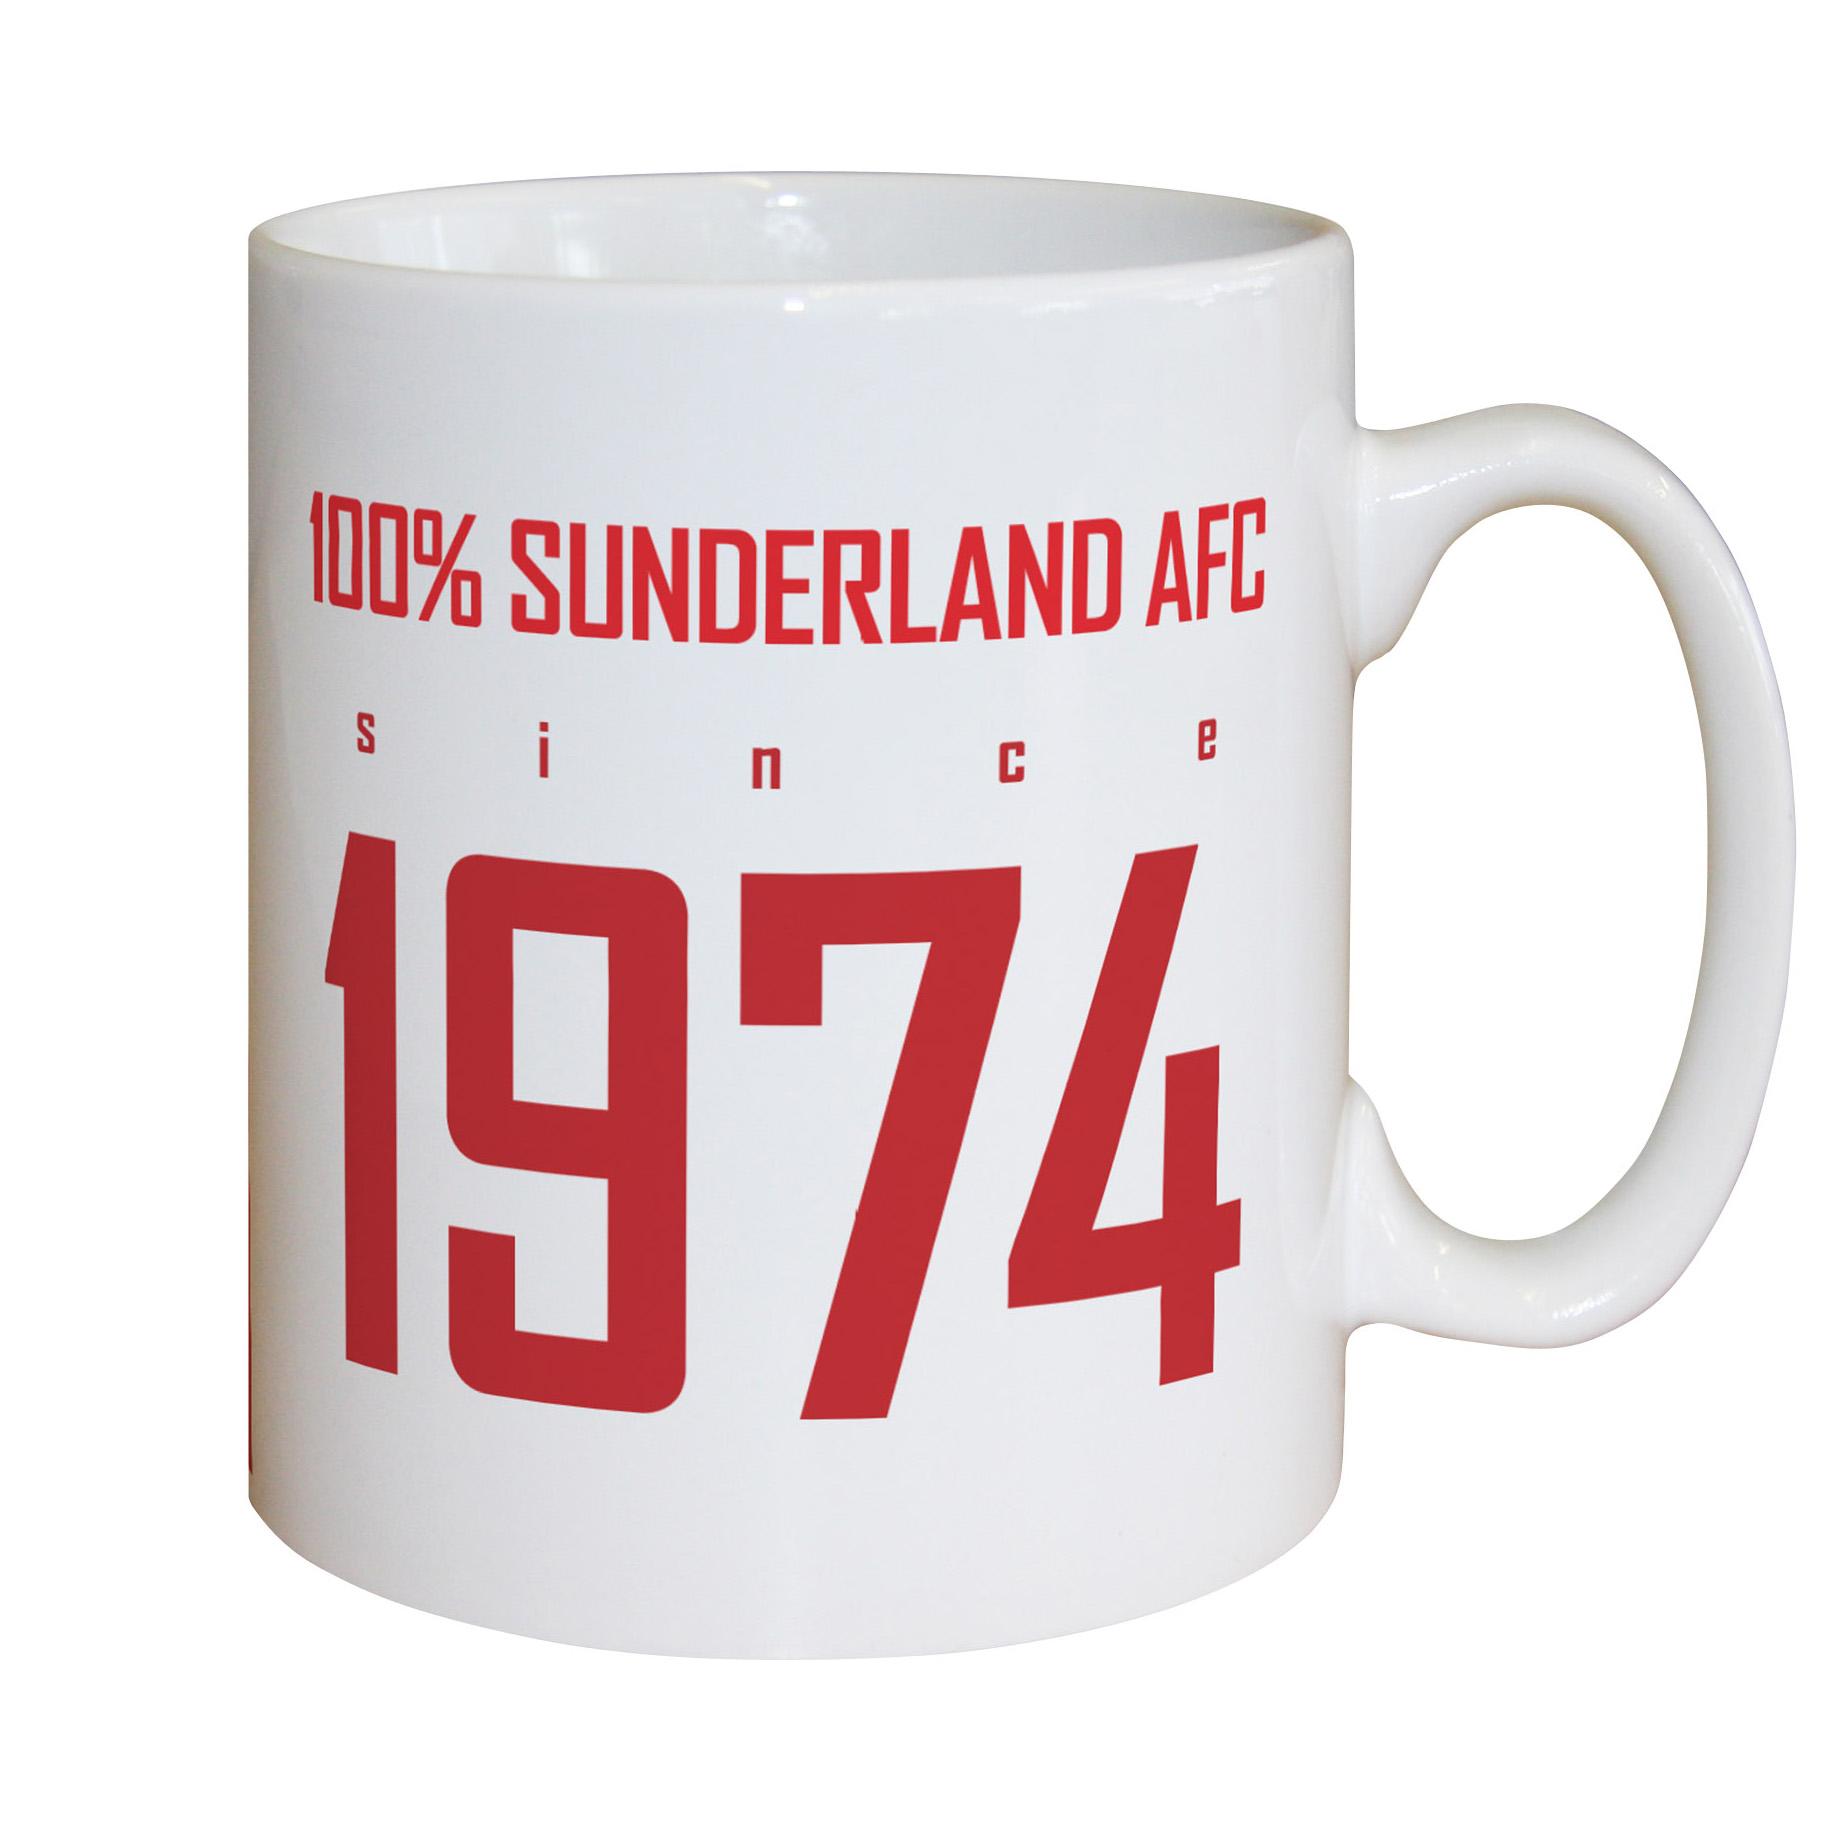 Sunderland Personalised 100 Percent Sunderland Mug